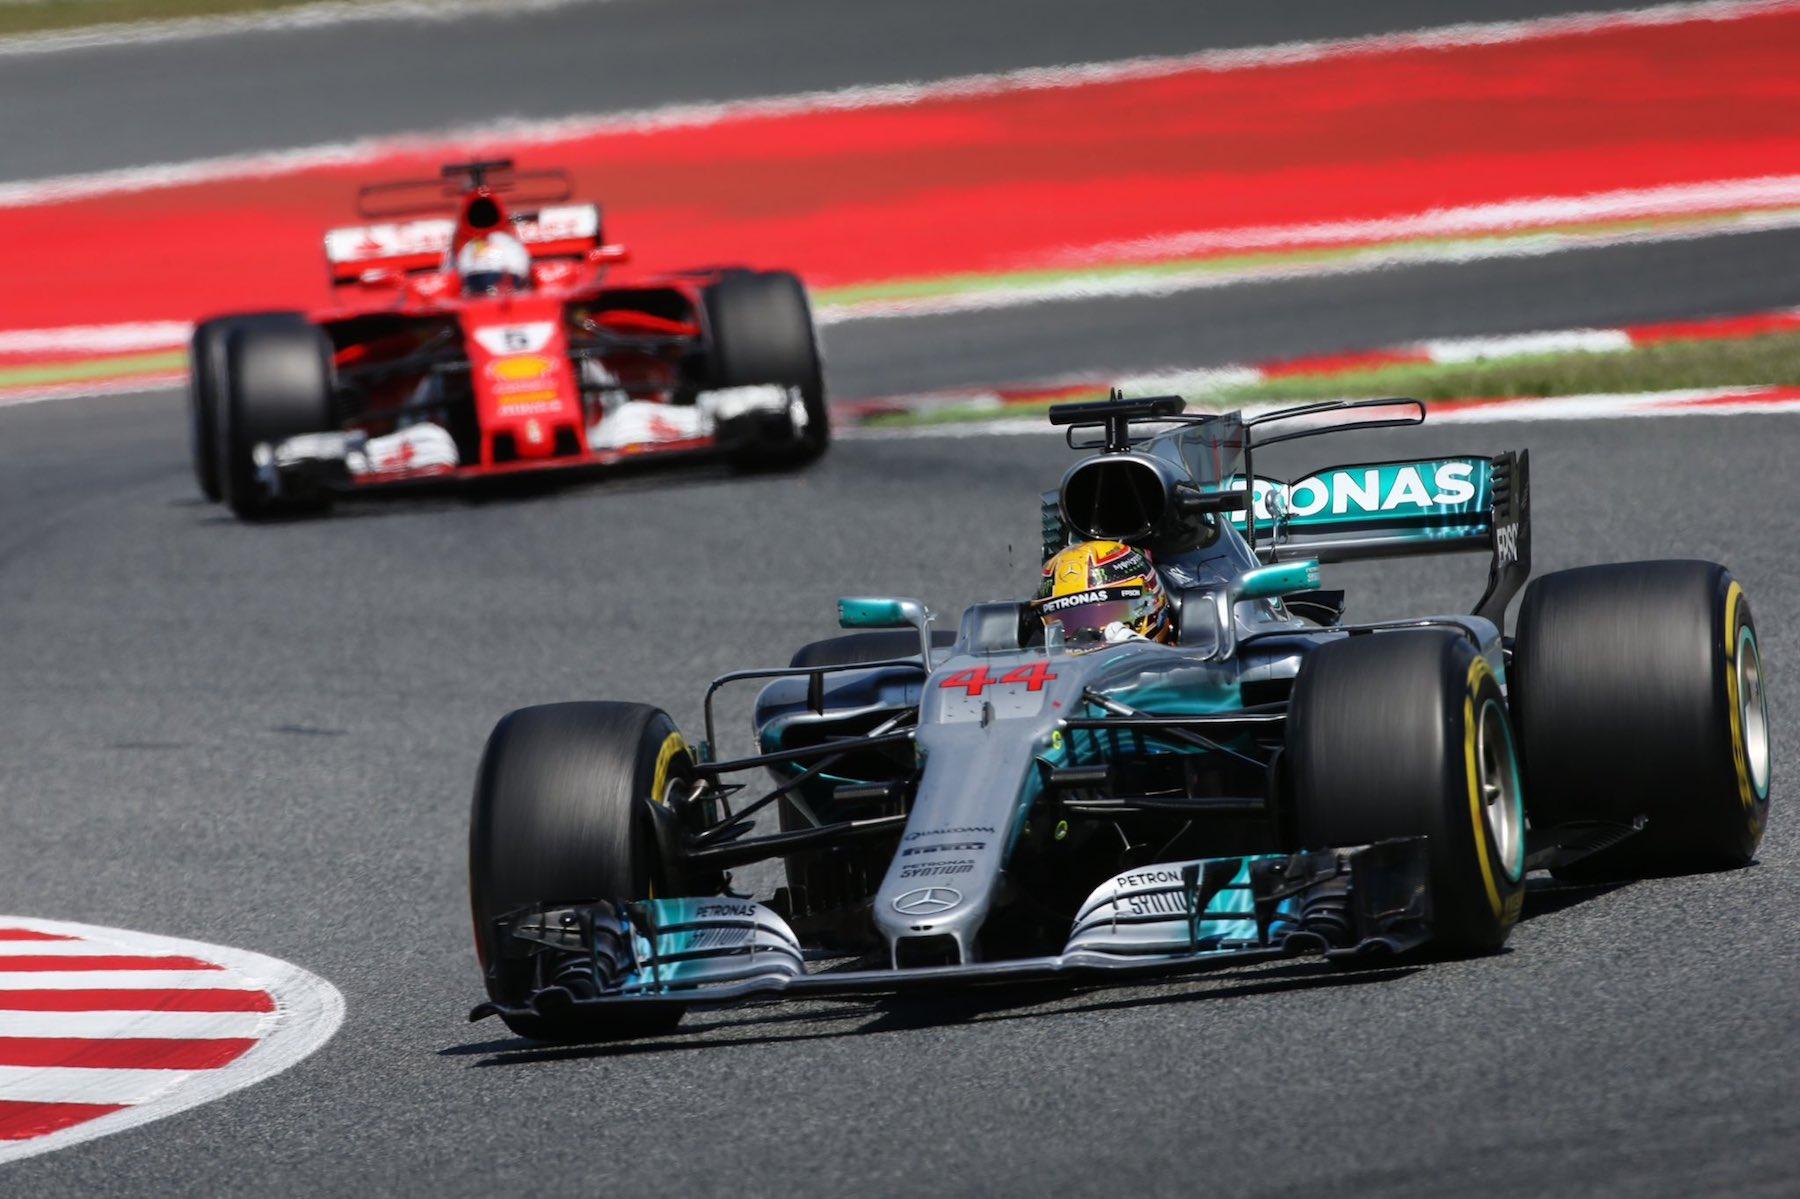 M 2017 Lewis Hamilton and Sebastian Vettel | 2017 Spanish GP 2 copy.jpg